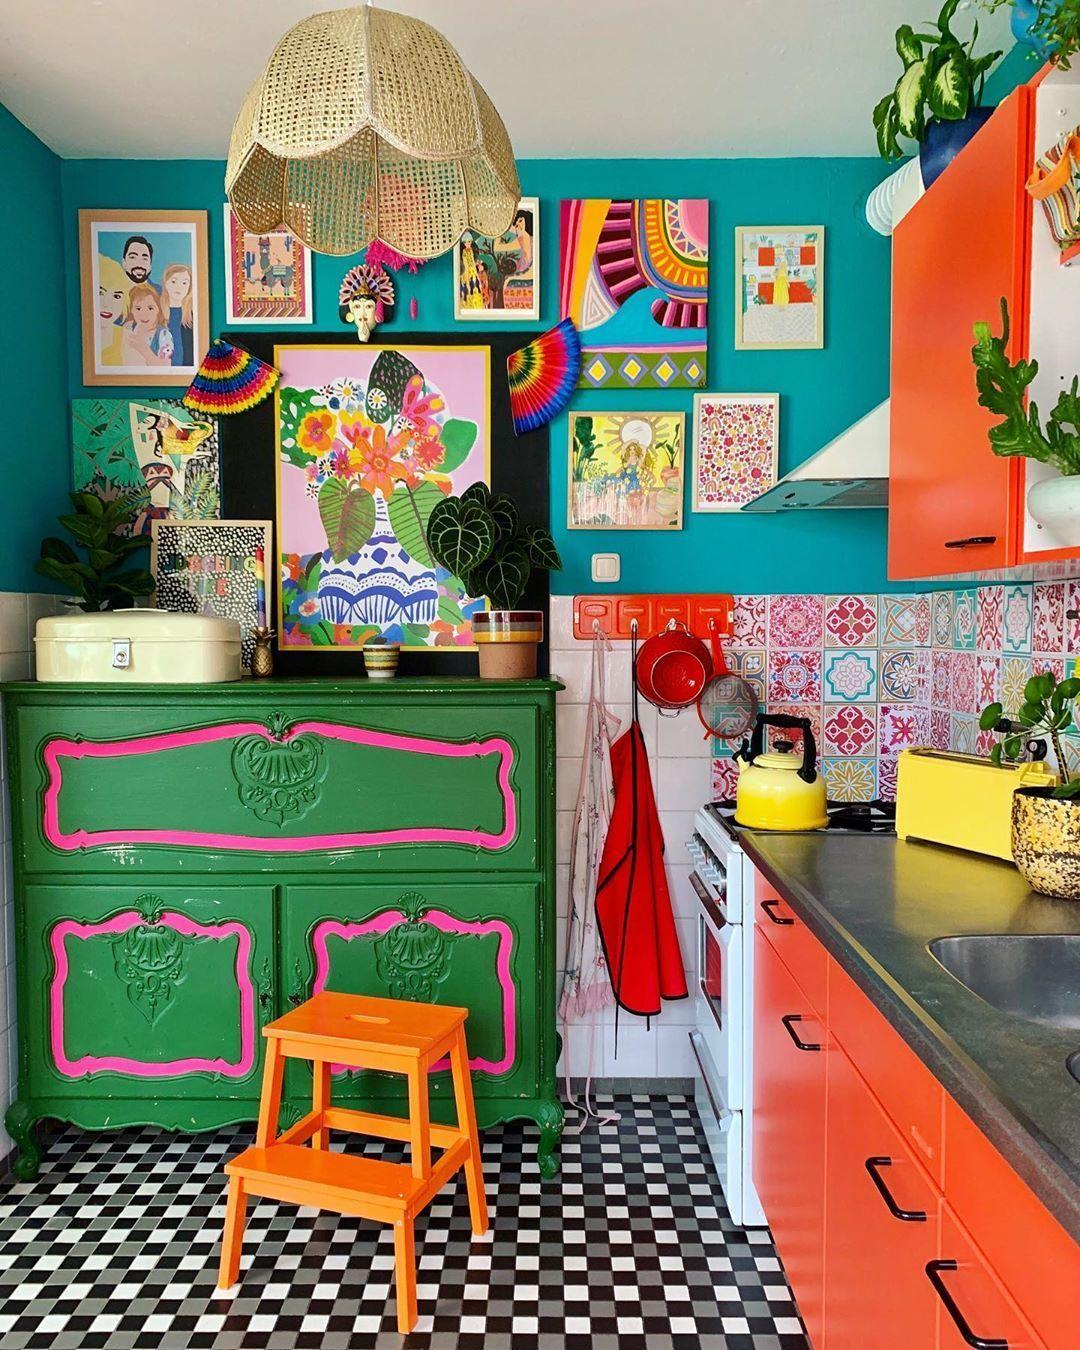 pin by amelie la mort on kitchen in 2020 hippie home decor home decor aesthetic room decor on kitchen decor hippie id=73653